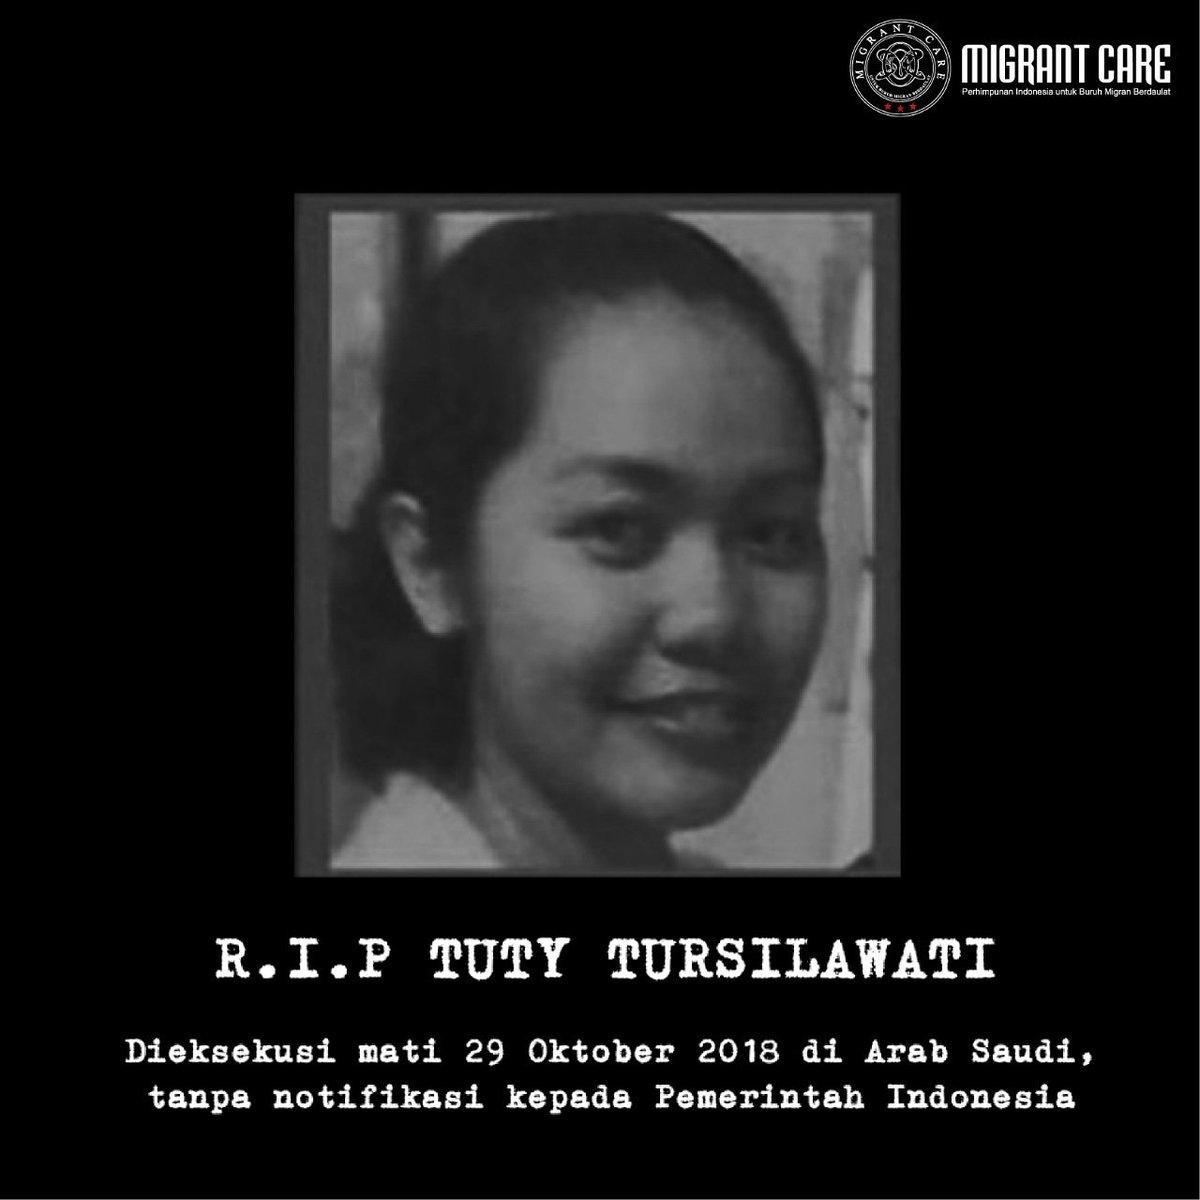 Arab Saudi eksekusi mati Tuty tanpa pemberitahuan ke Indonesi